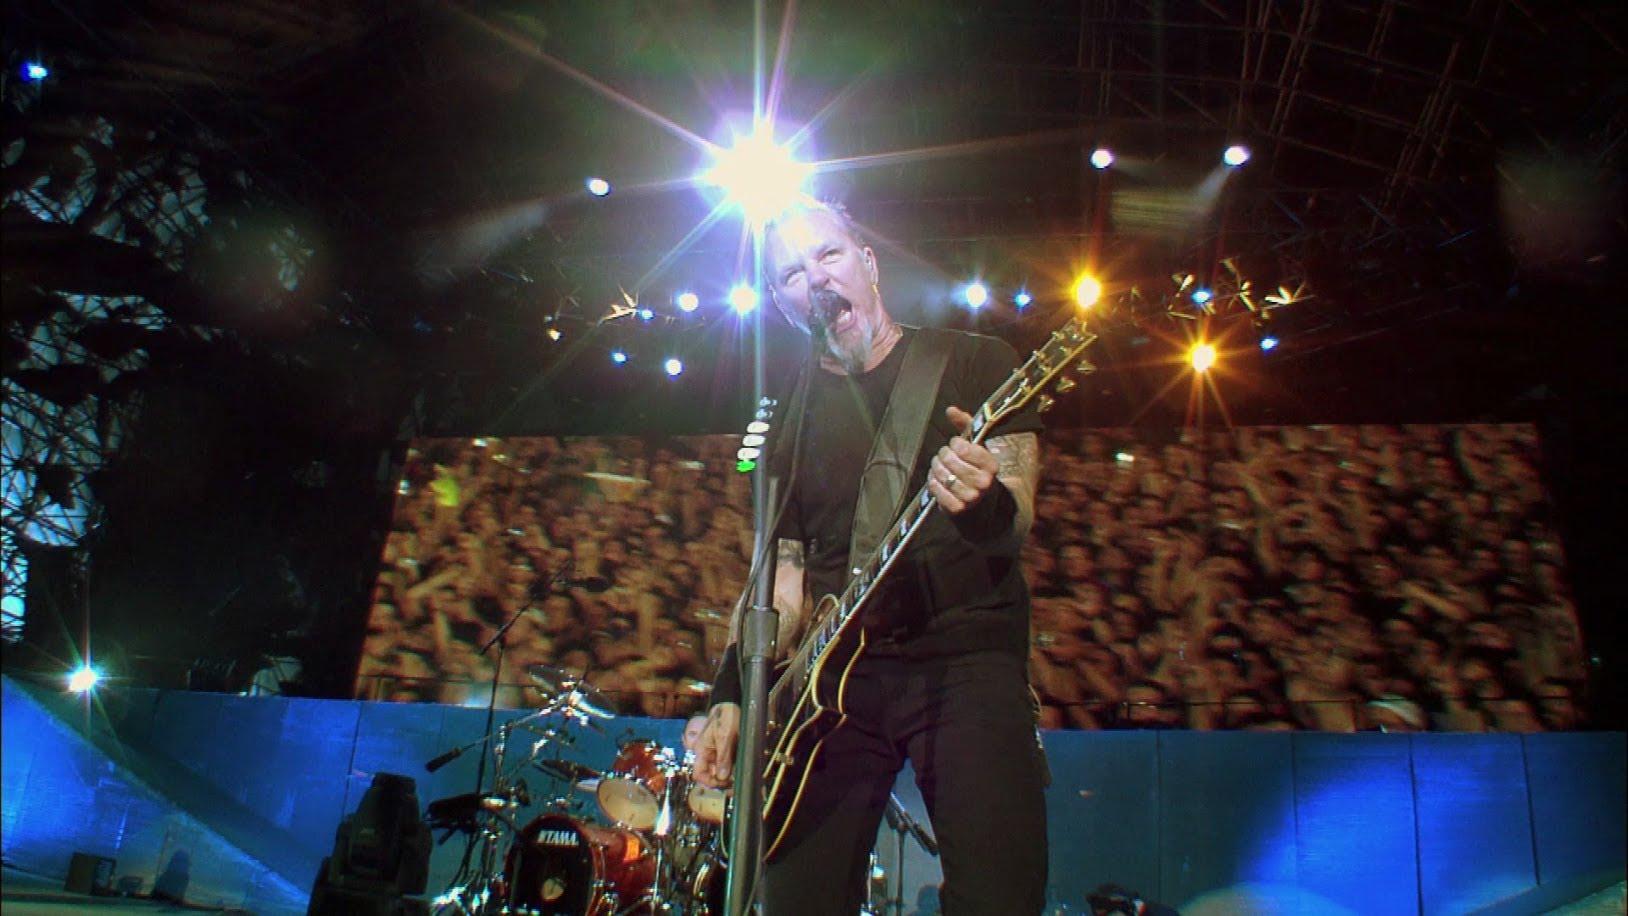 Metallica - Disposable Heroes (Live in Mexico City) Orgullo, Pasin, y Gloria